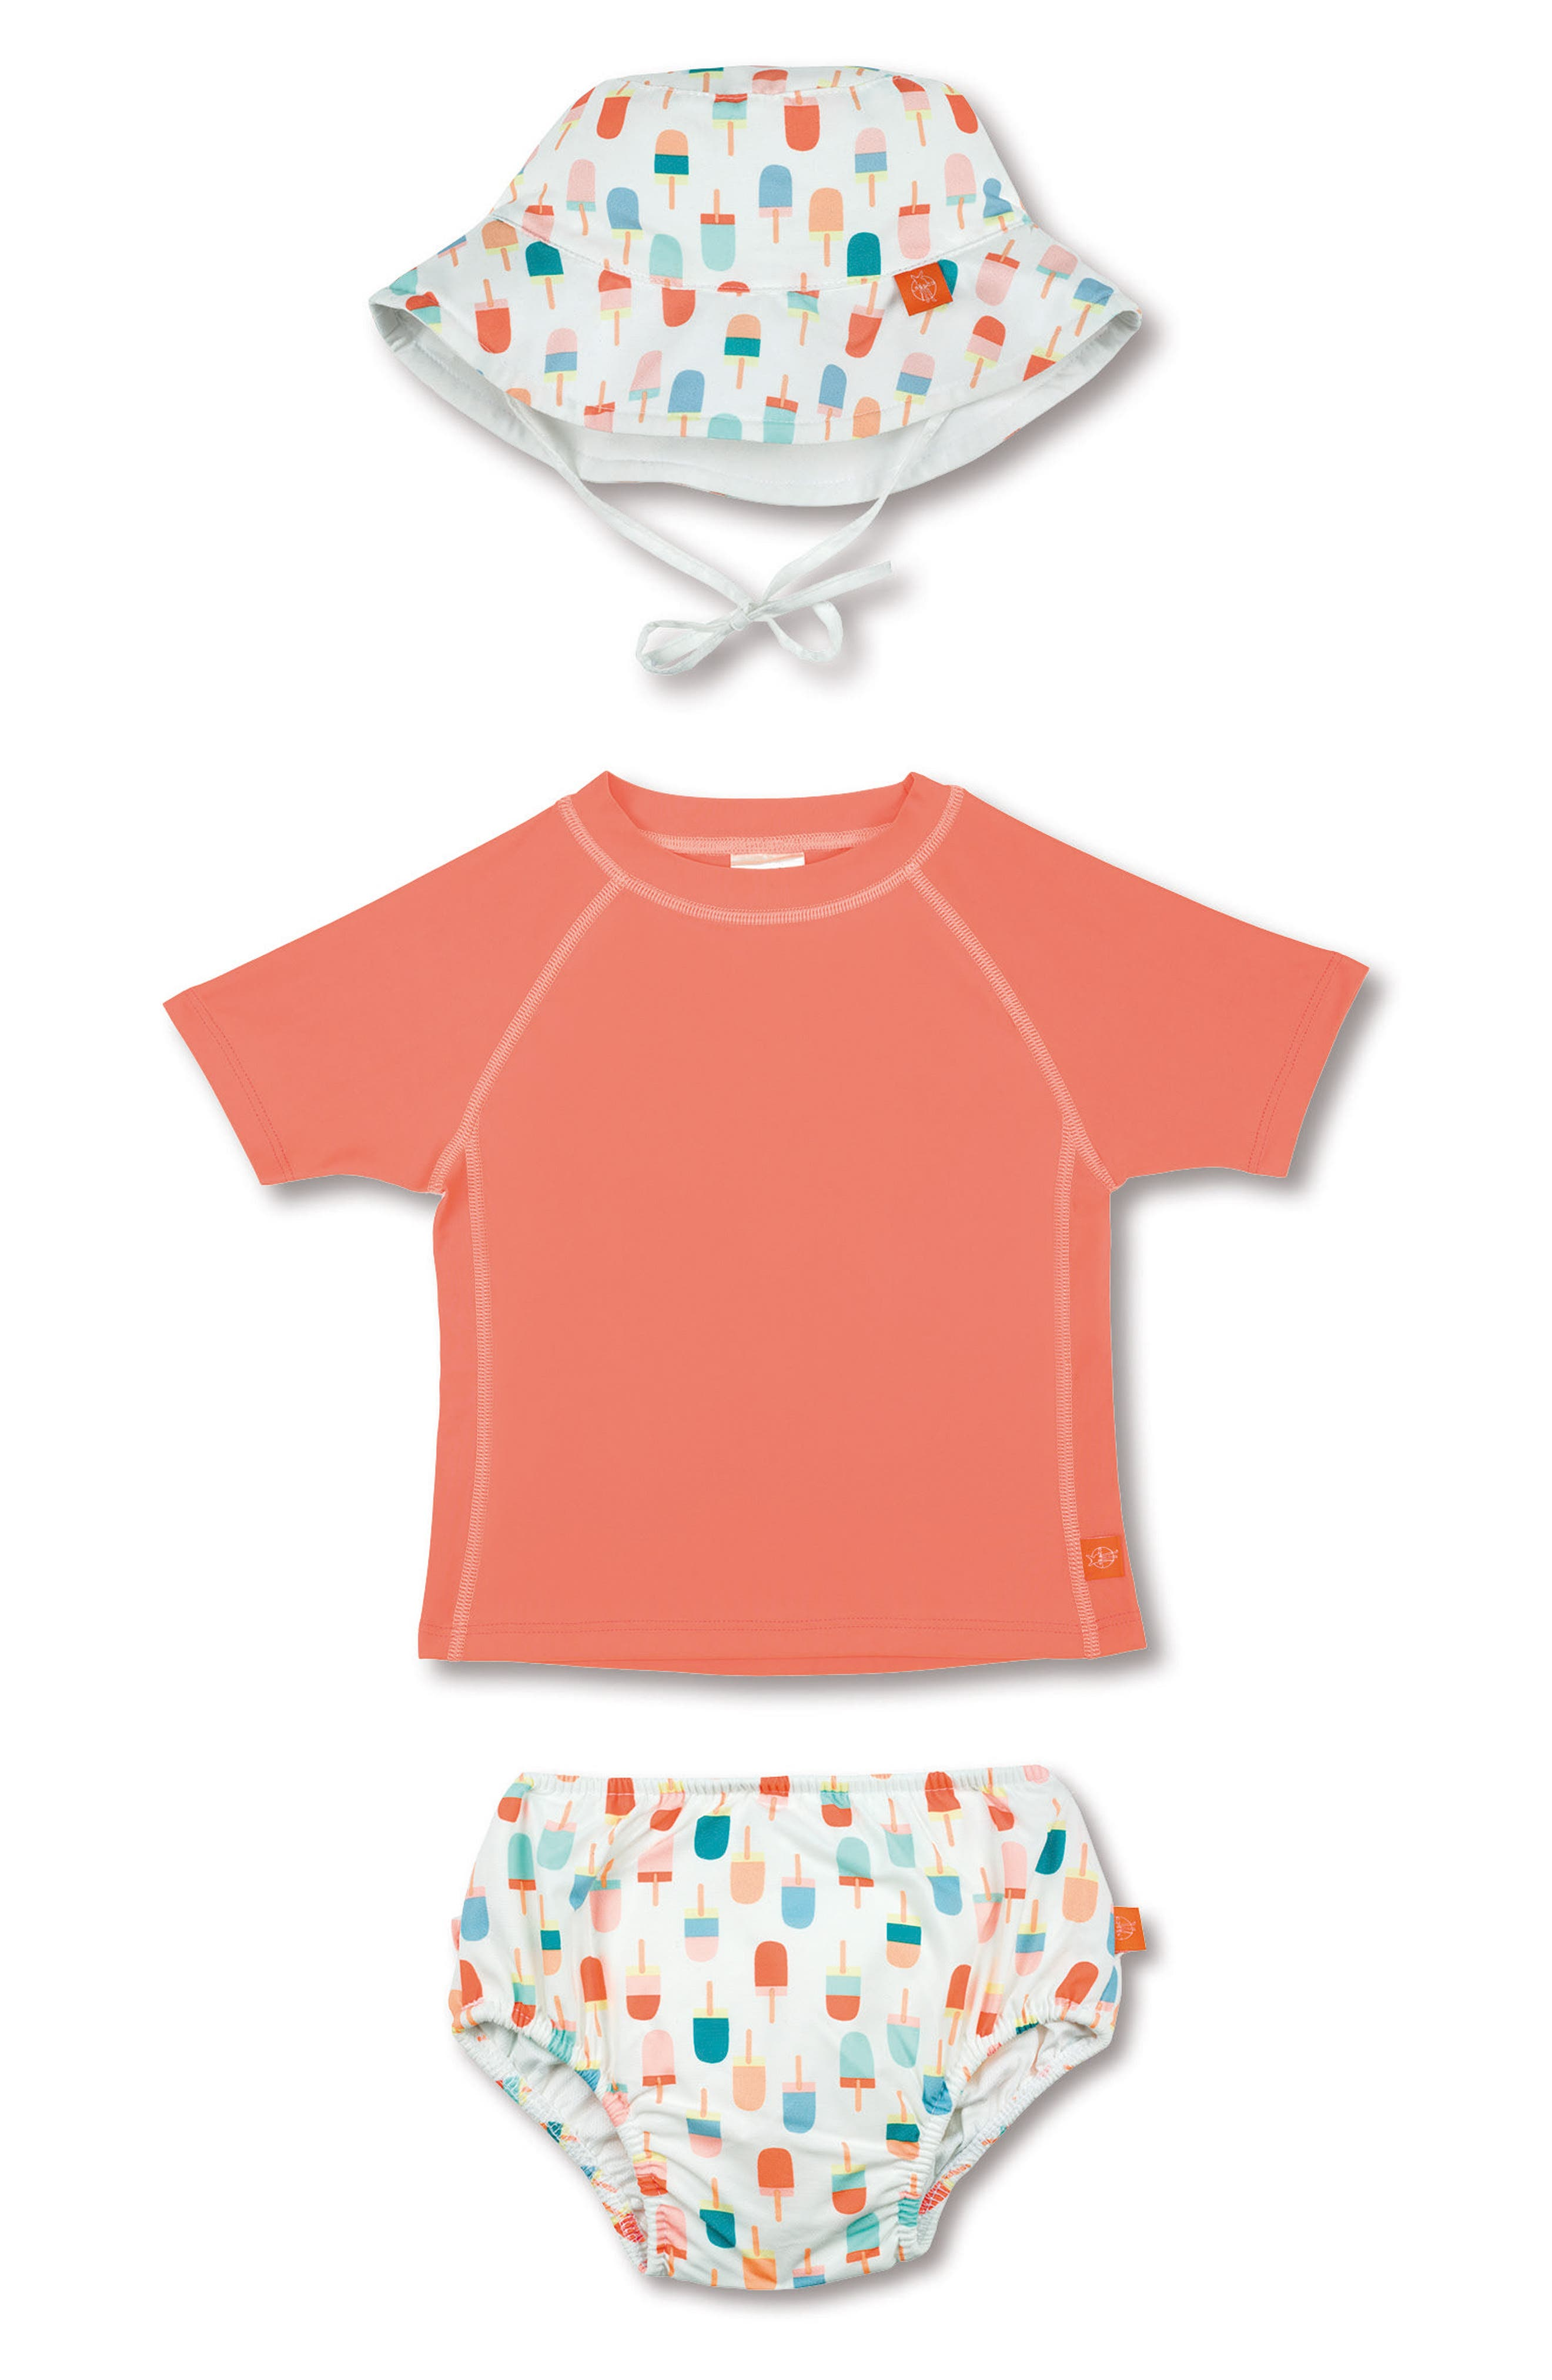 Main Image - Lassig Two-Piece Rashguard Swimsuit & Hat Set (Baby & Toddler)